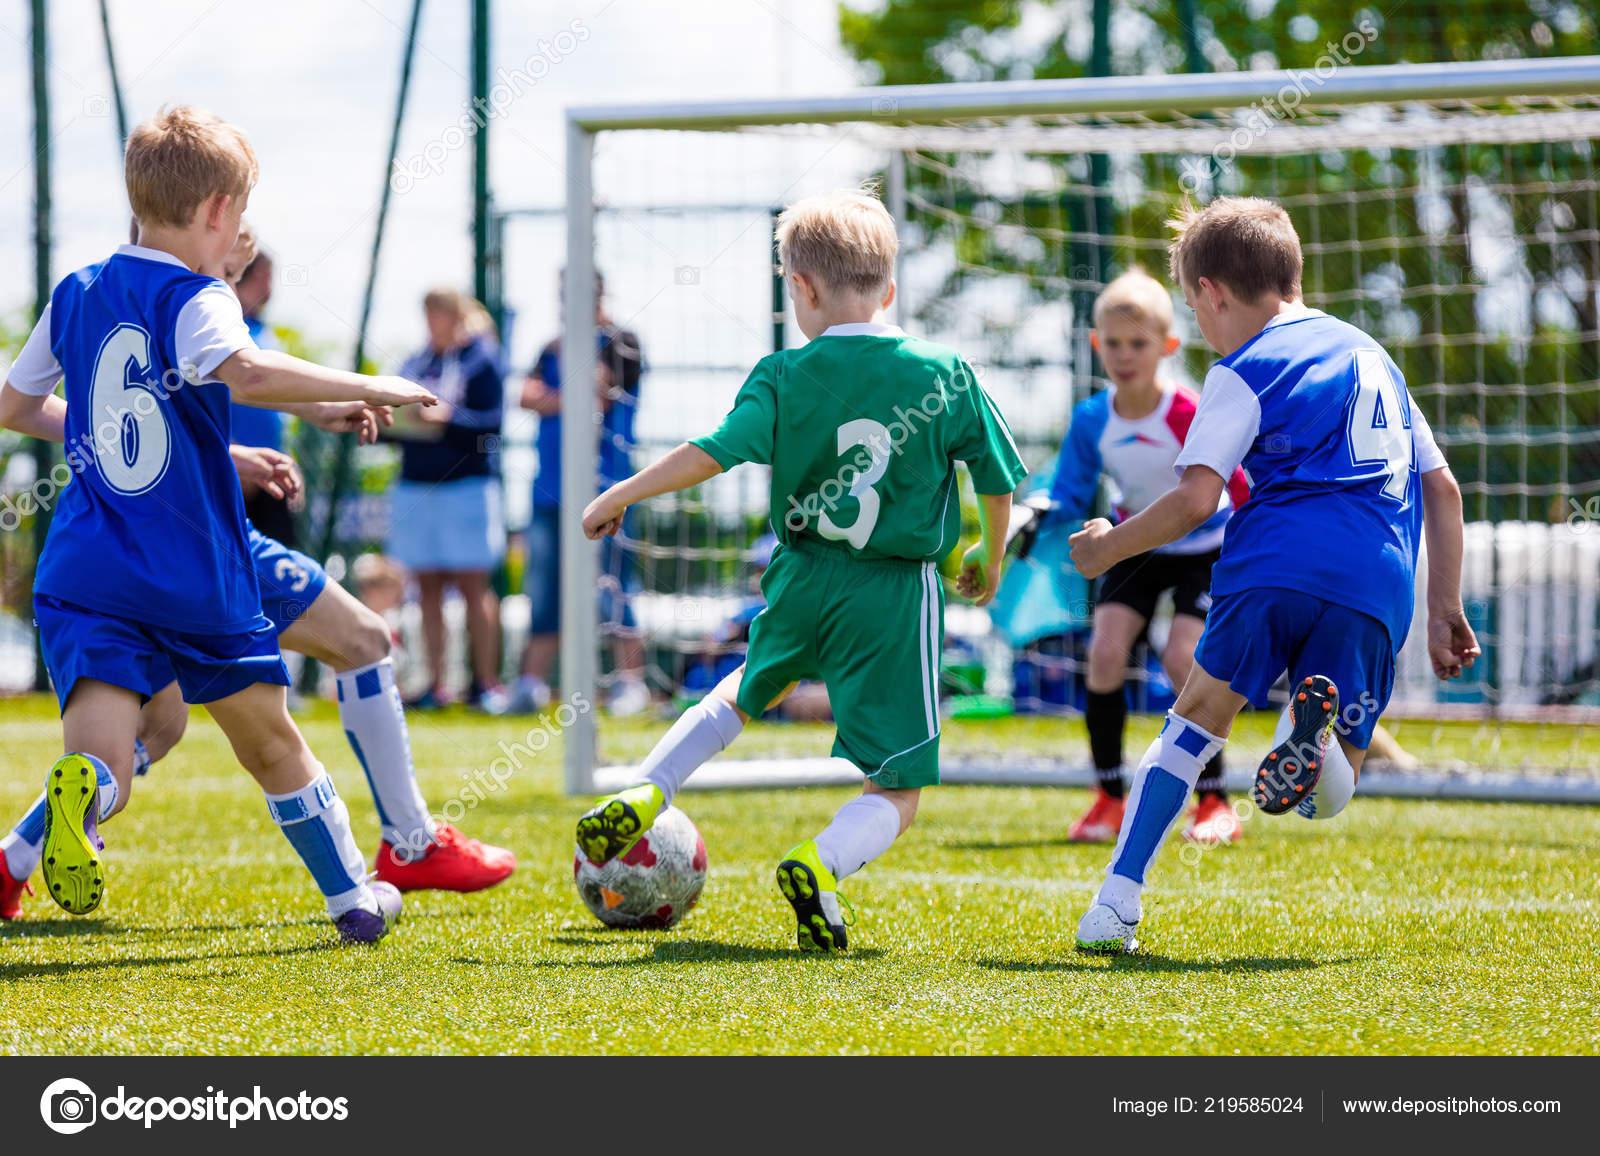 Fussball Fussball Spiel Fur Kinder Jungs Spielen Fussball Spiel